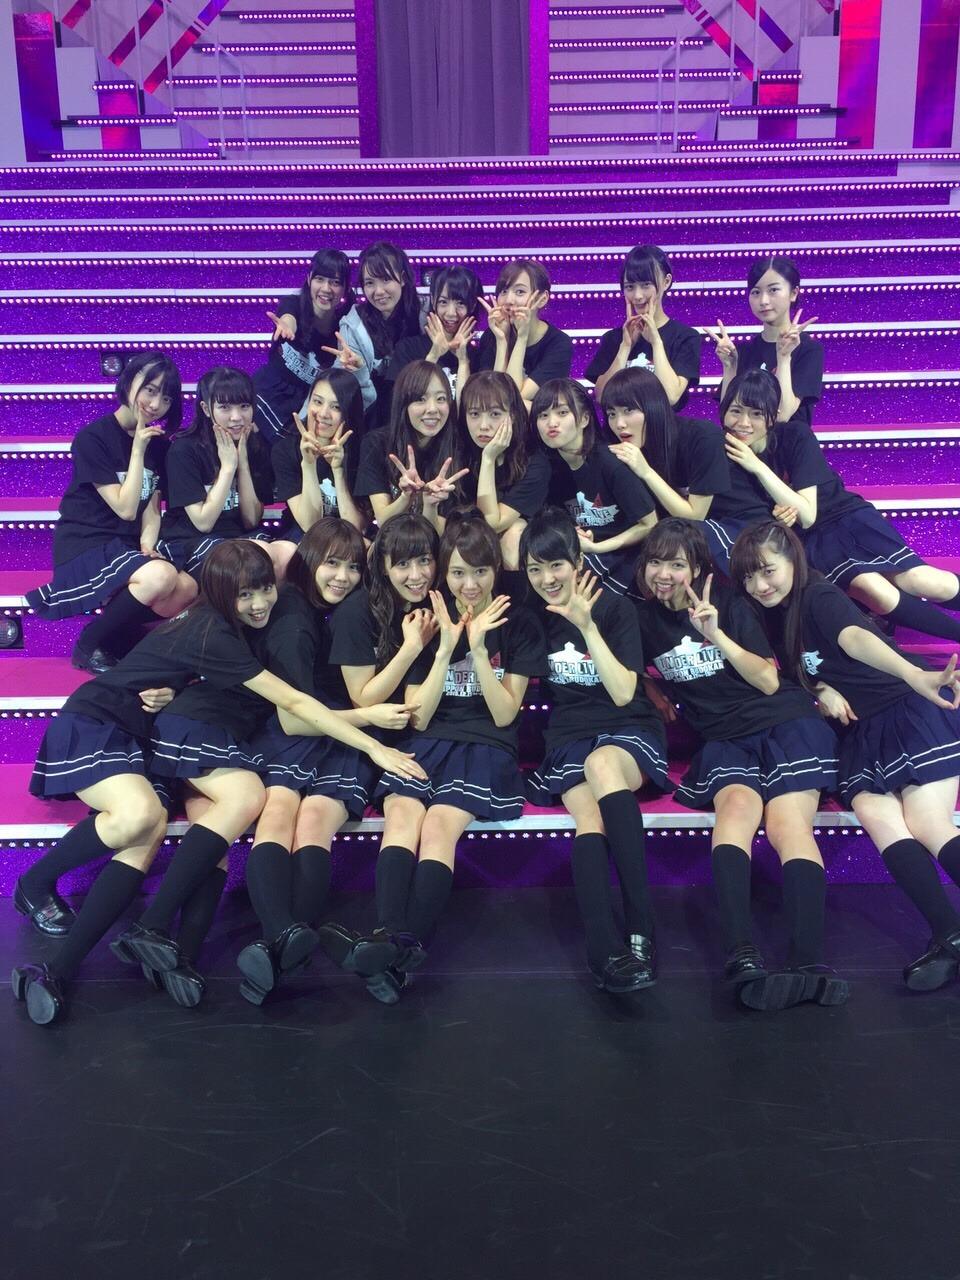 A Pop Idols 233320 Itou Karin Nogizaka46 伊藤かりん 乃木坂46